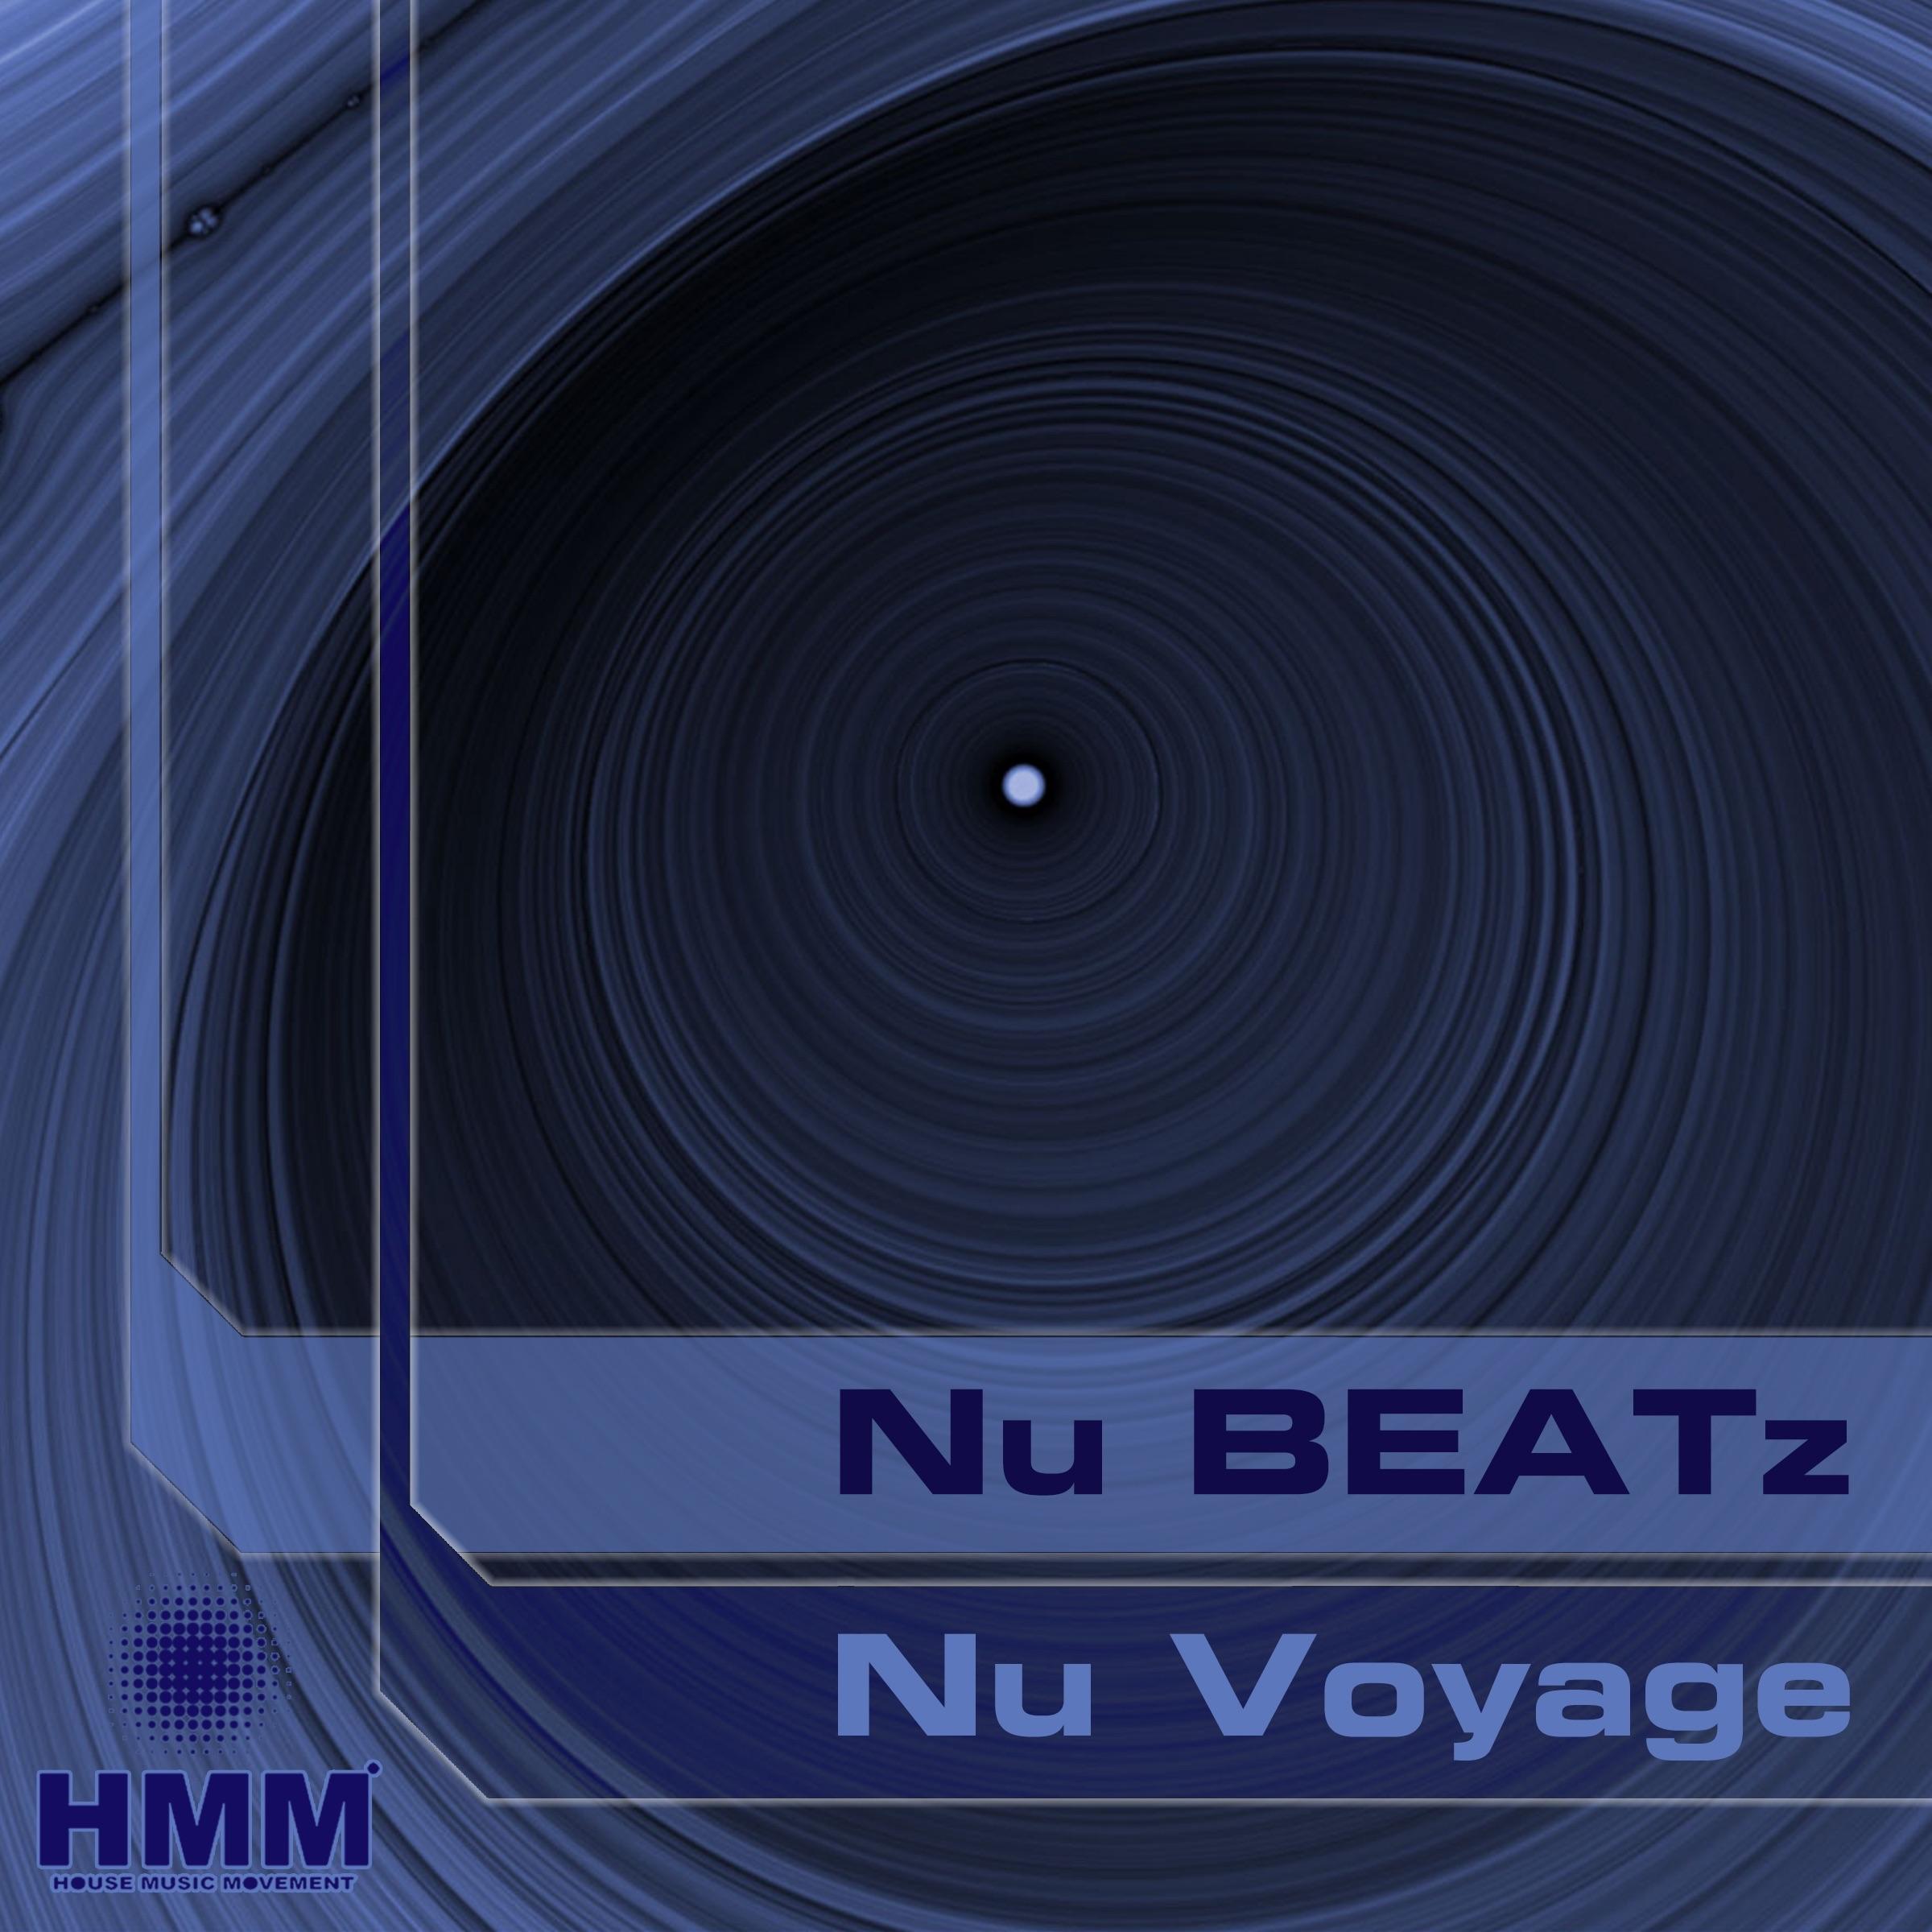 Nu Voyage (Fulvio Perniola Anthem Mix *)